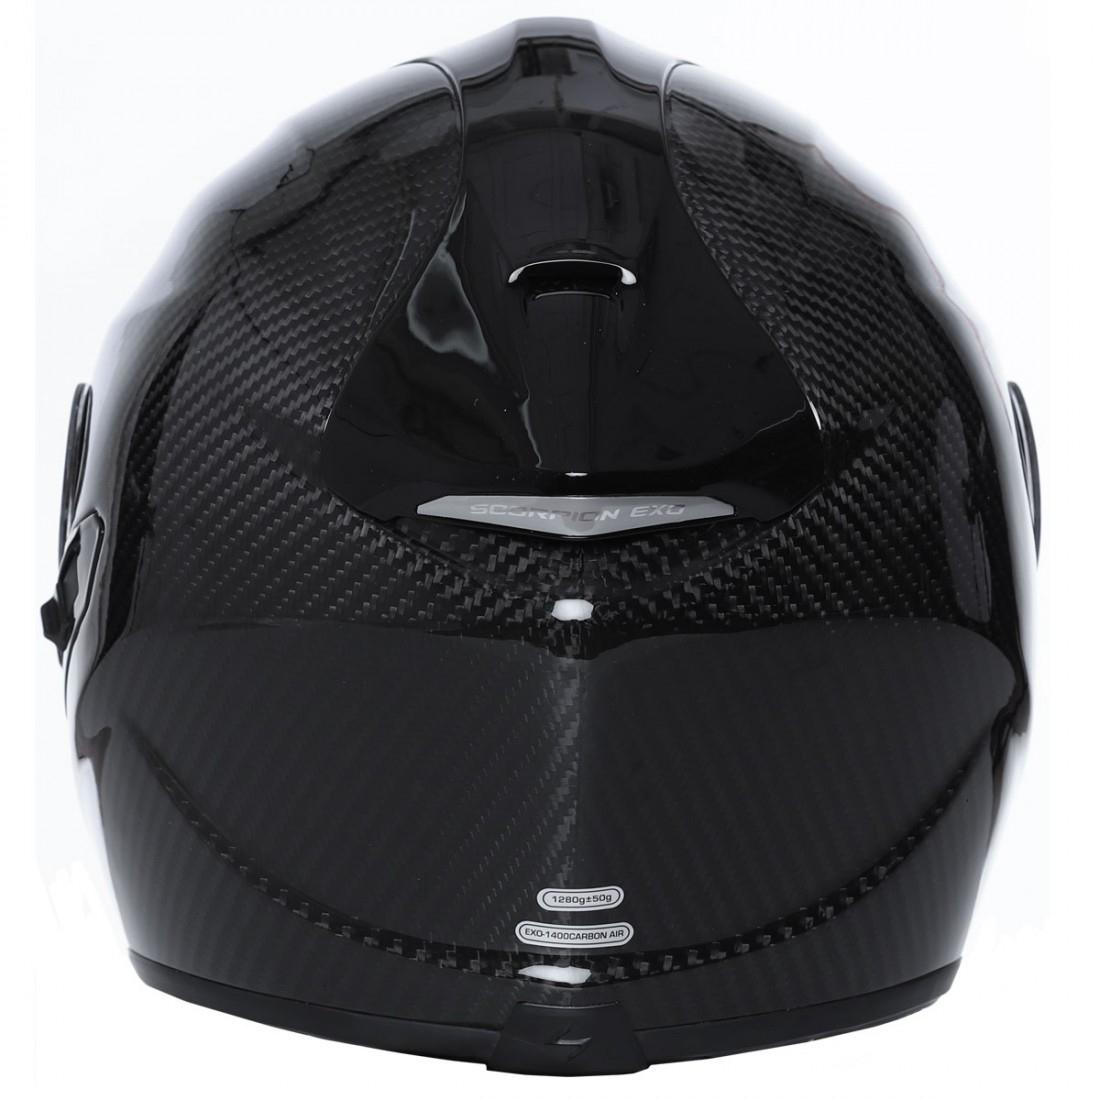 helm scorpion exo 1400 carbon air solid motocard. Black Bedroom Furniture Sets. Home Design Ideas